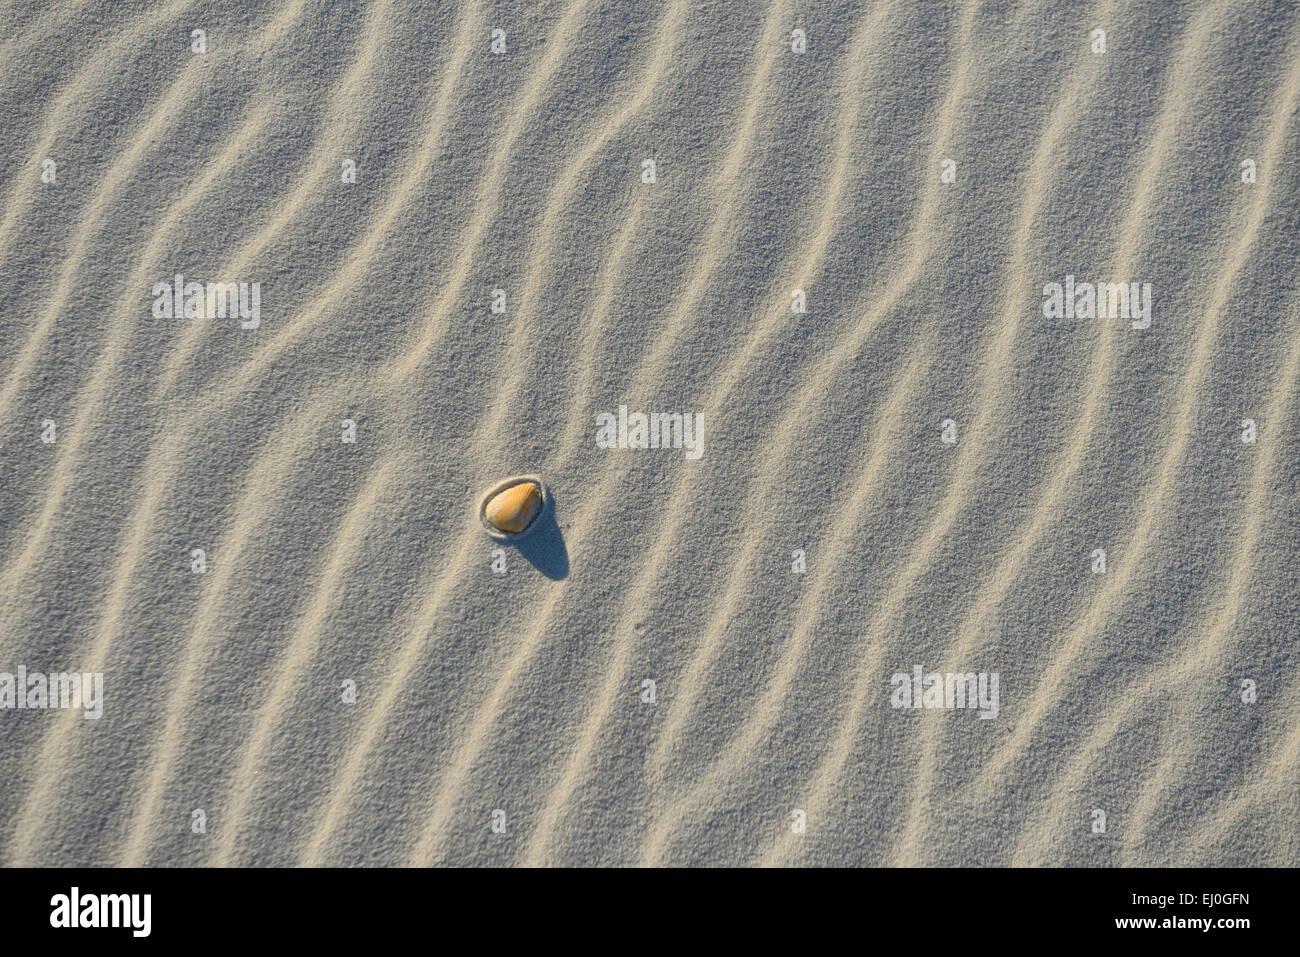 USA, Florida, Franklin County, Gulf of Mexico, Apalachicola, St. George Island, State Park, sea shell, sand, dune, Stock Photo